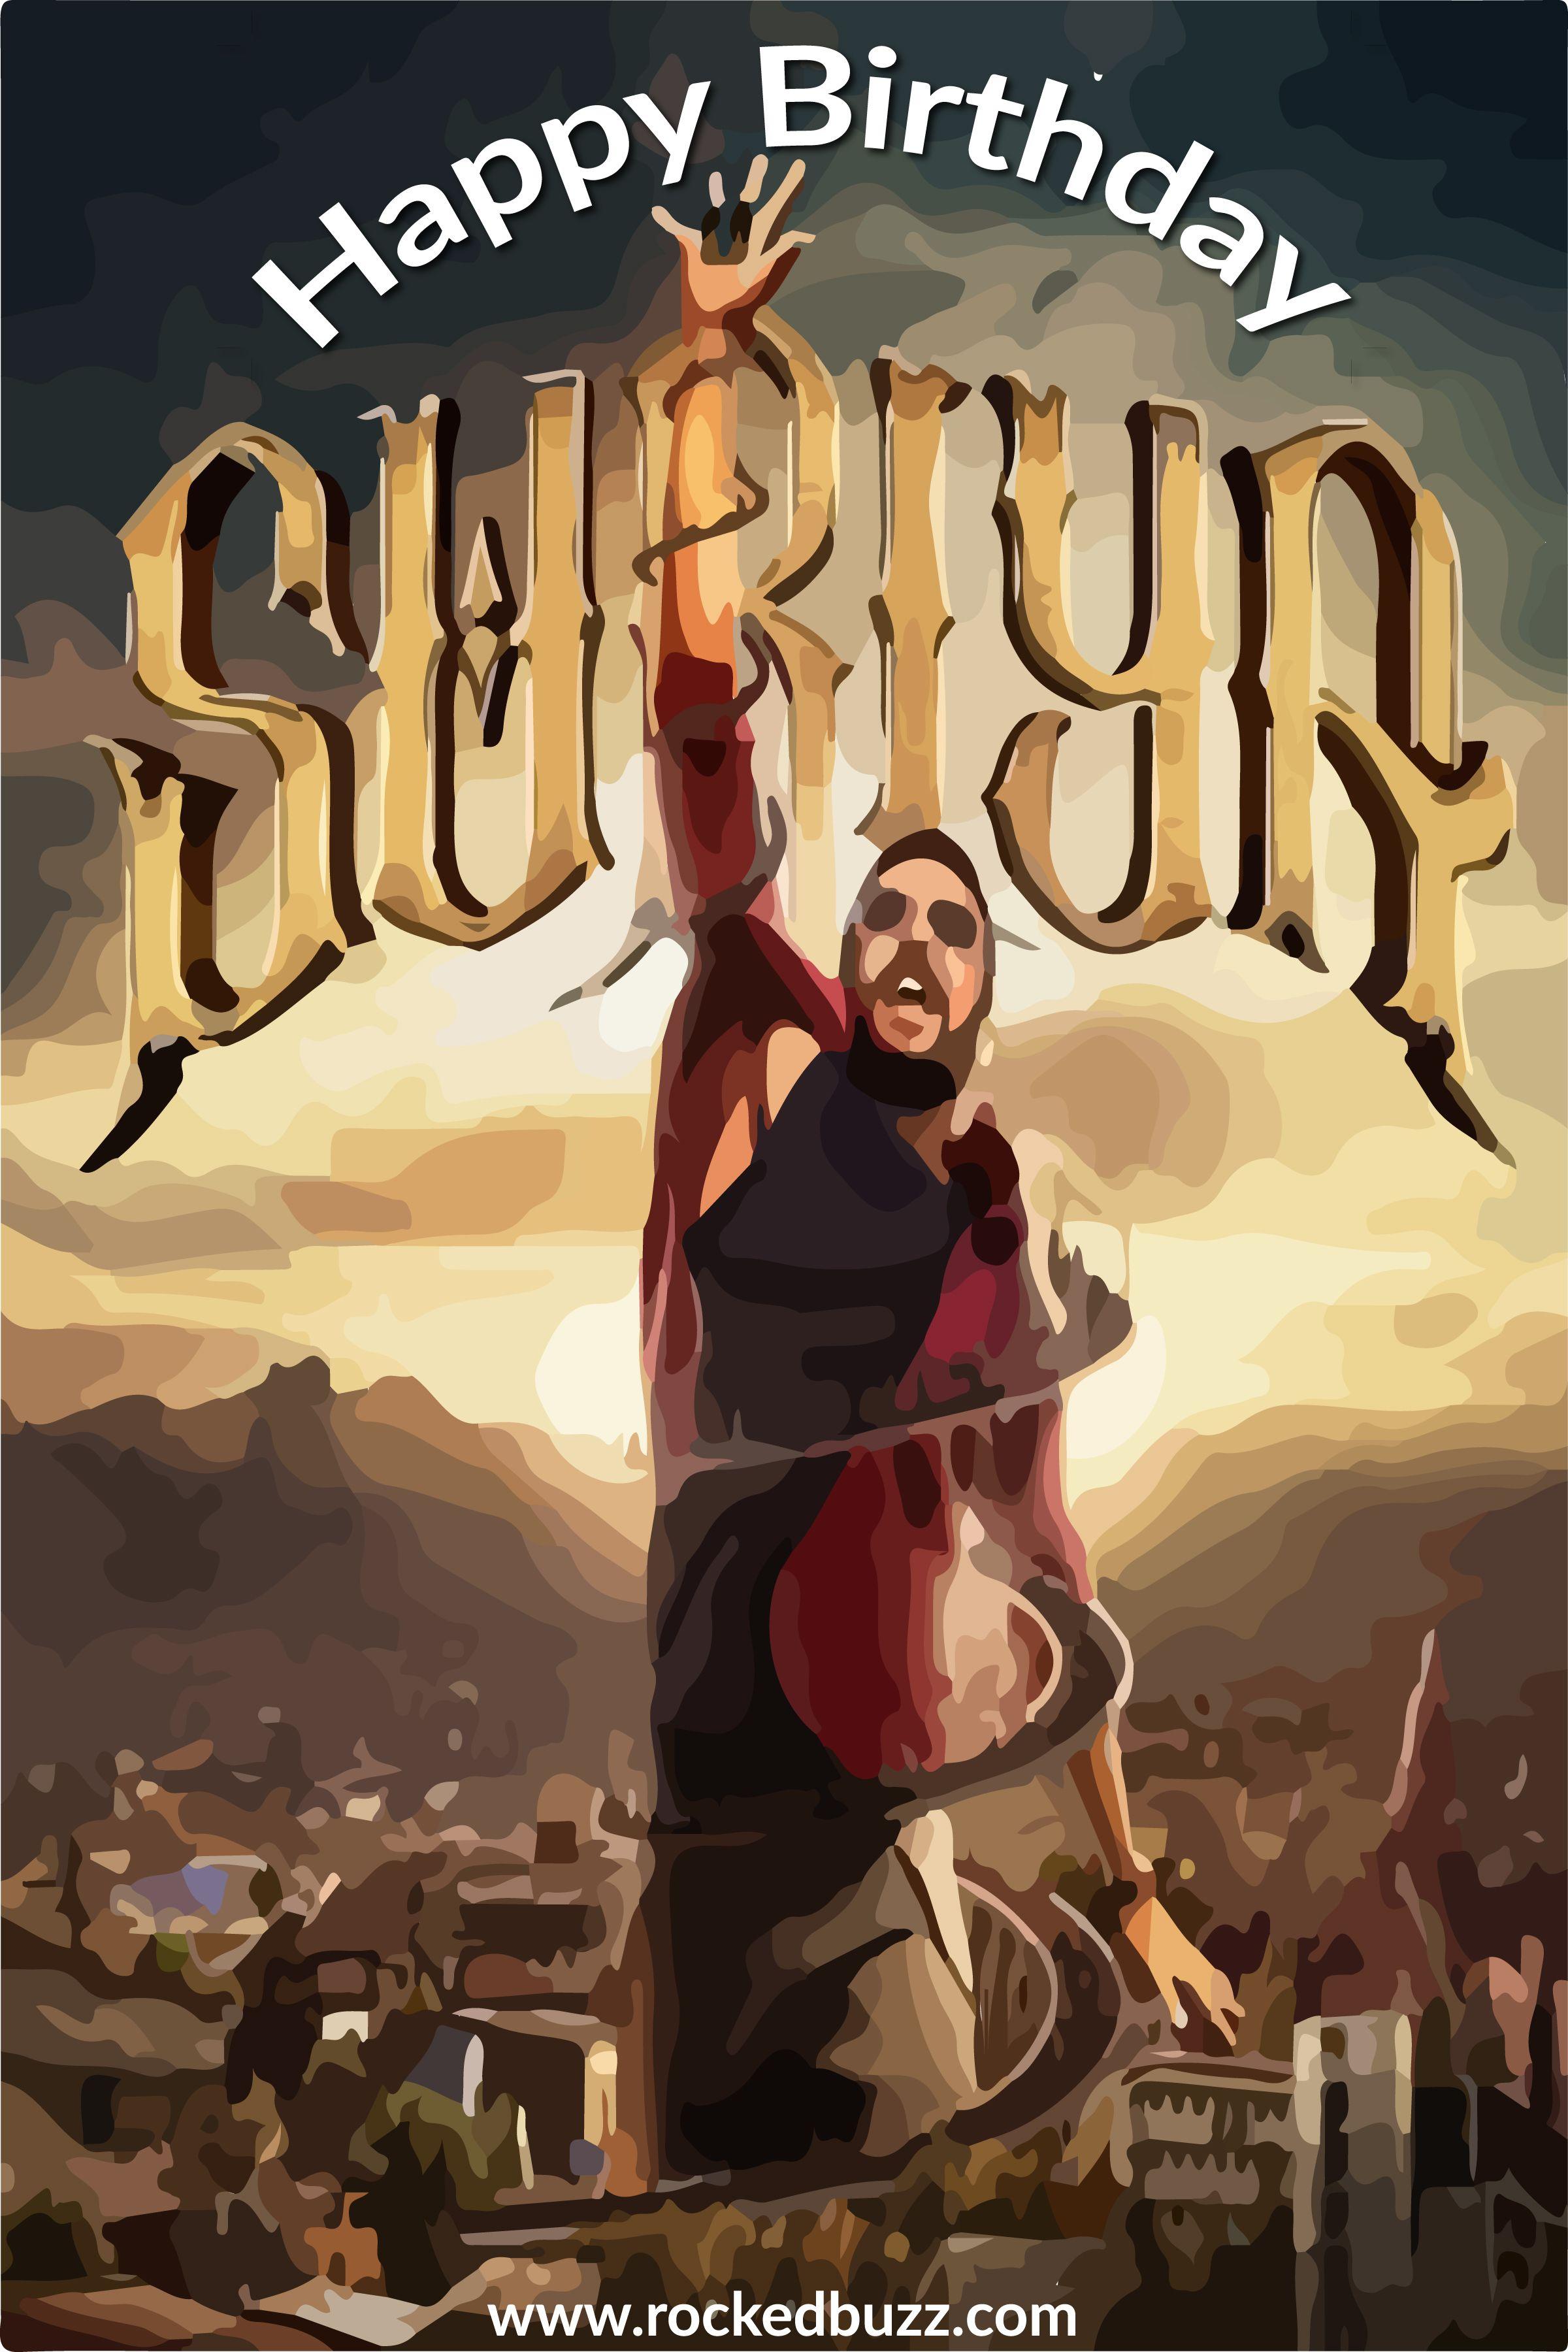 Soorarai Pottru Movie Full Free Download In 2020 Amazon Prime Video Movies Prime Video